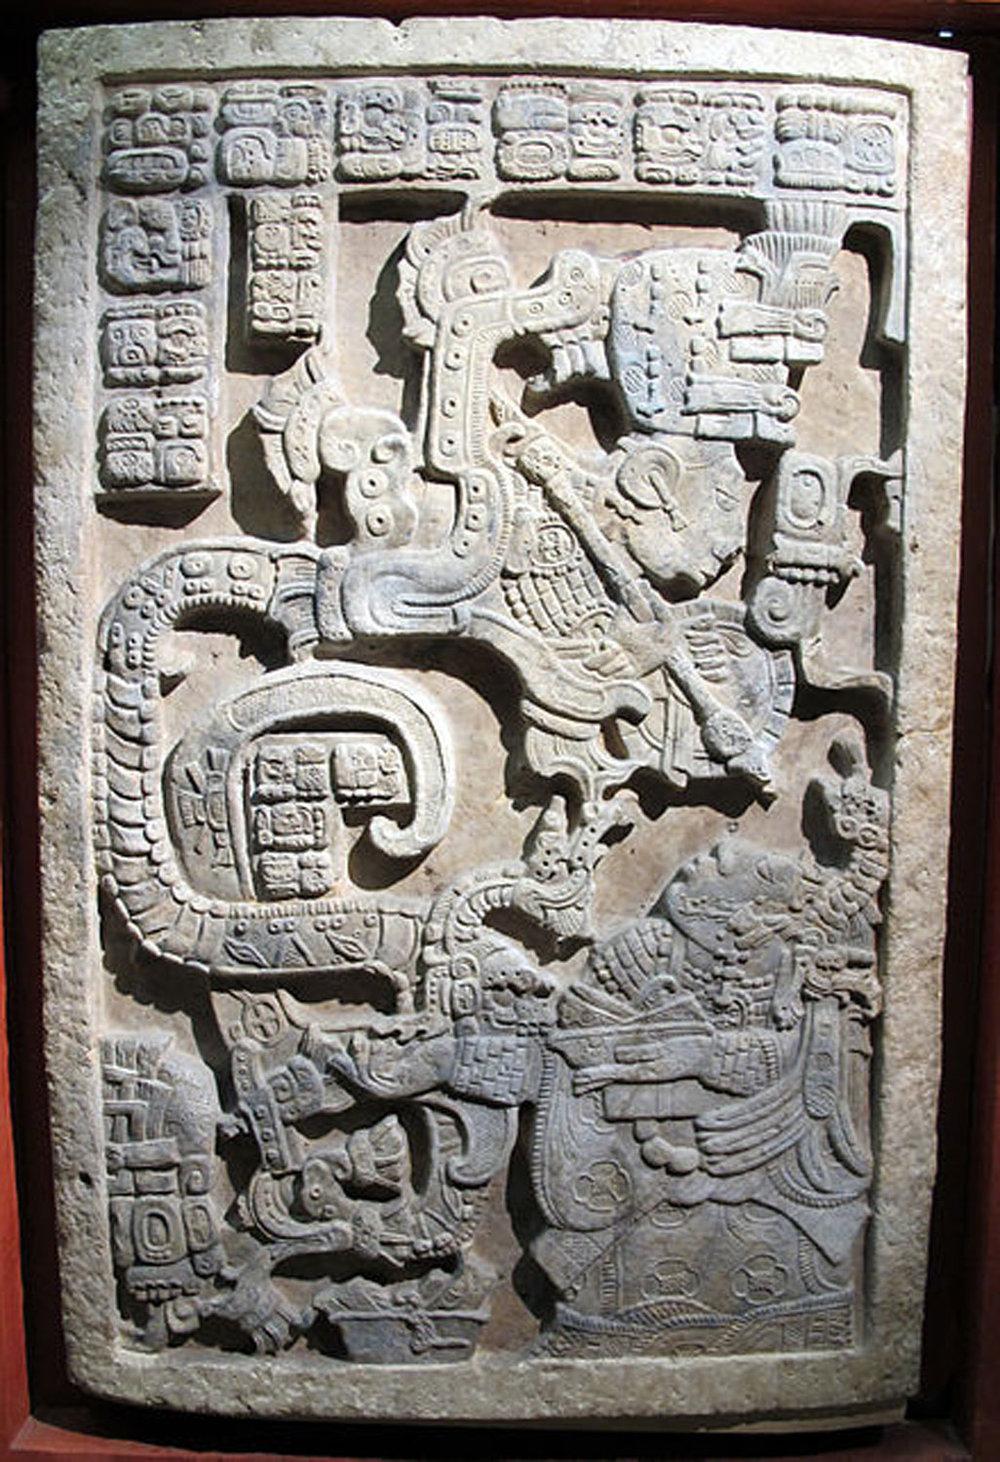 Hammocks_and_Ruins_Blog_Riviera_Maya_Mexico_Travel_Discover_Chiapas_What_to_do_Ruins_Yaxchilan_13.jpg